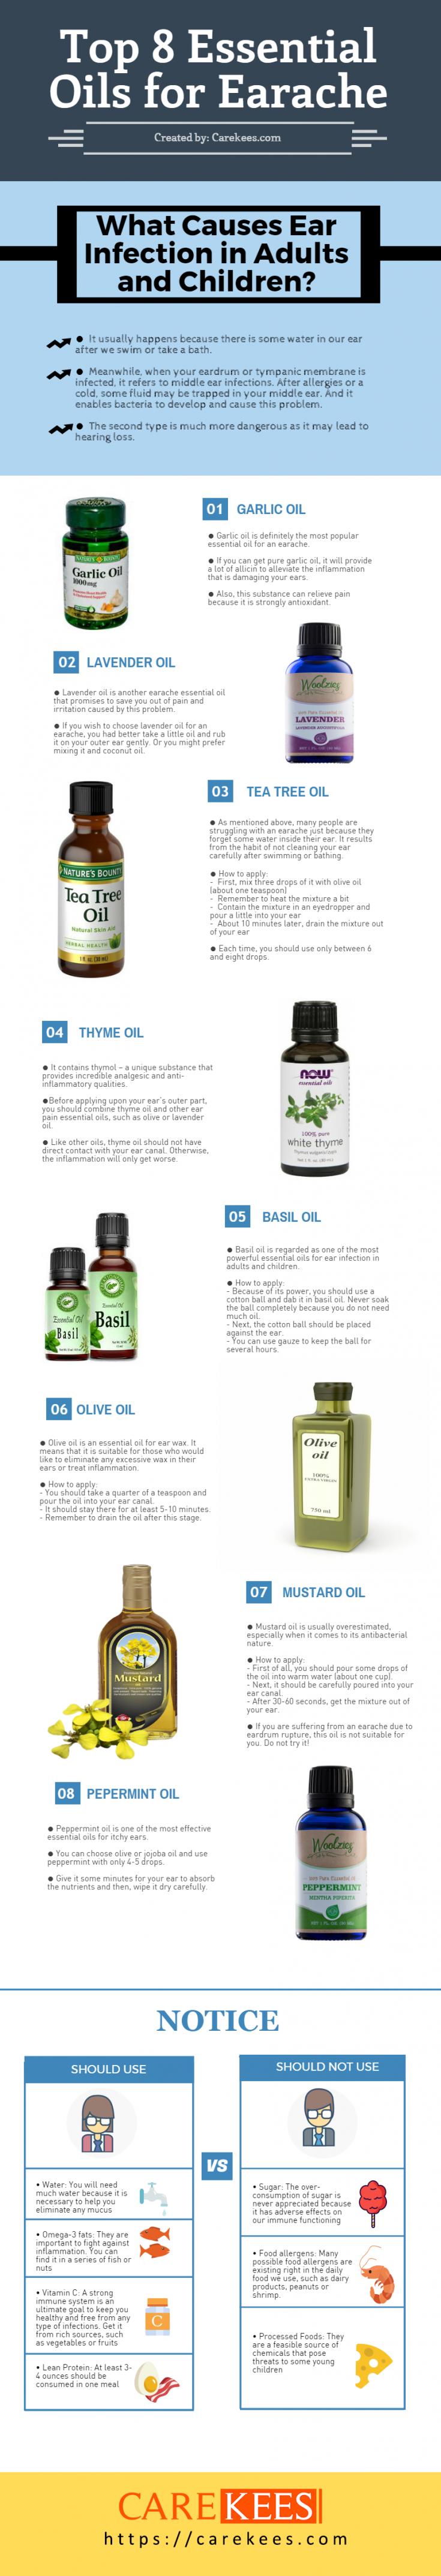 essential oils for earache